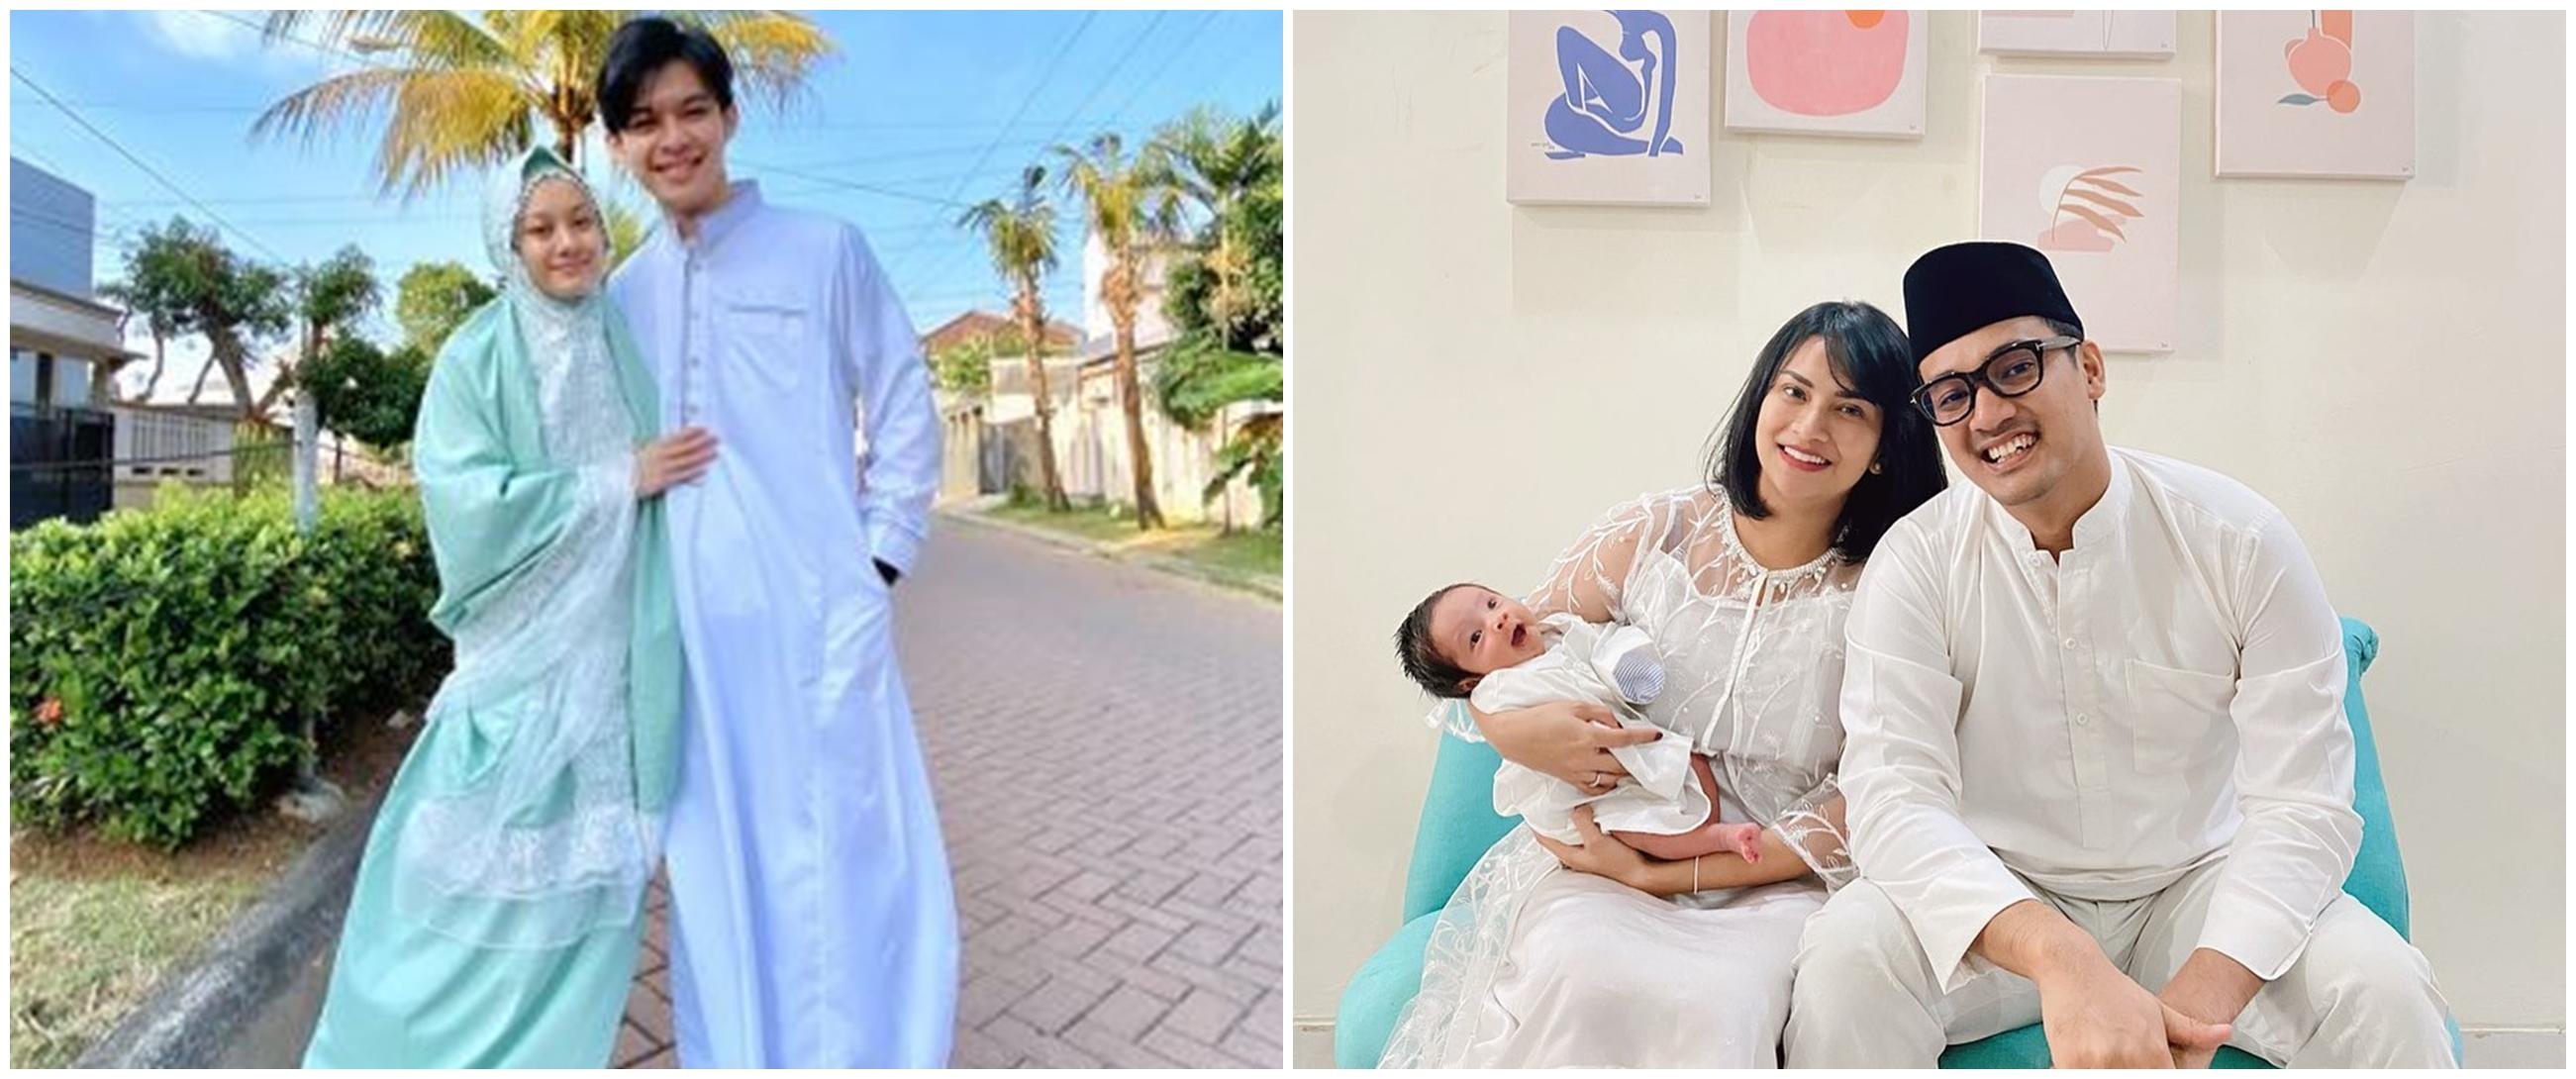 Momen 7 seleb rayakan Idul Adha pertama sama pasangan, bikin baper